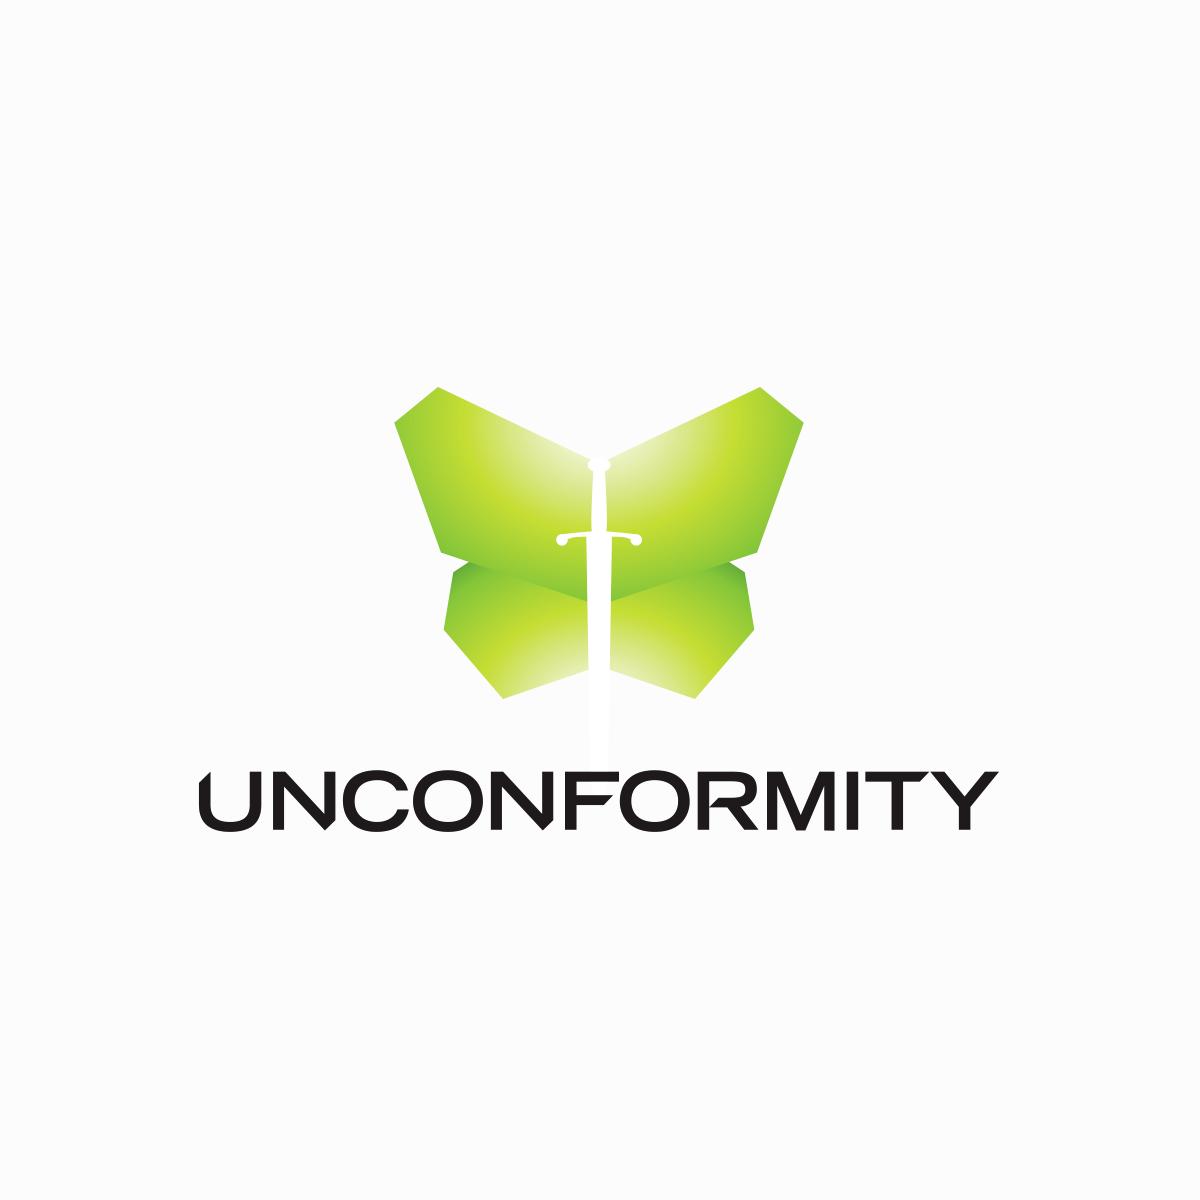 Unconformity, LLC